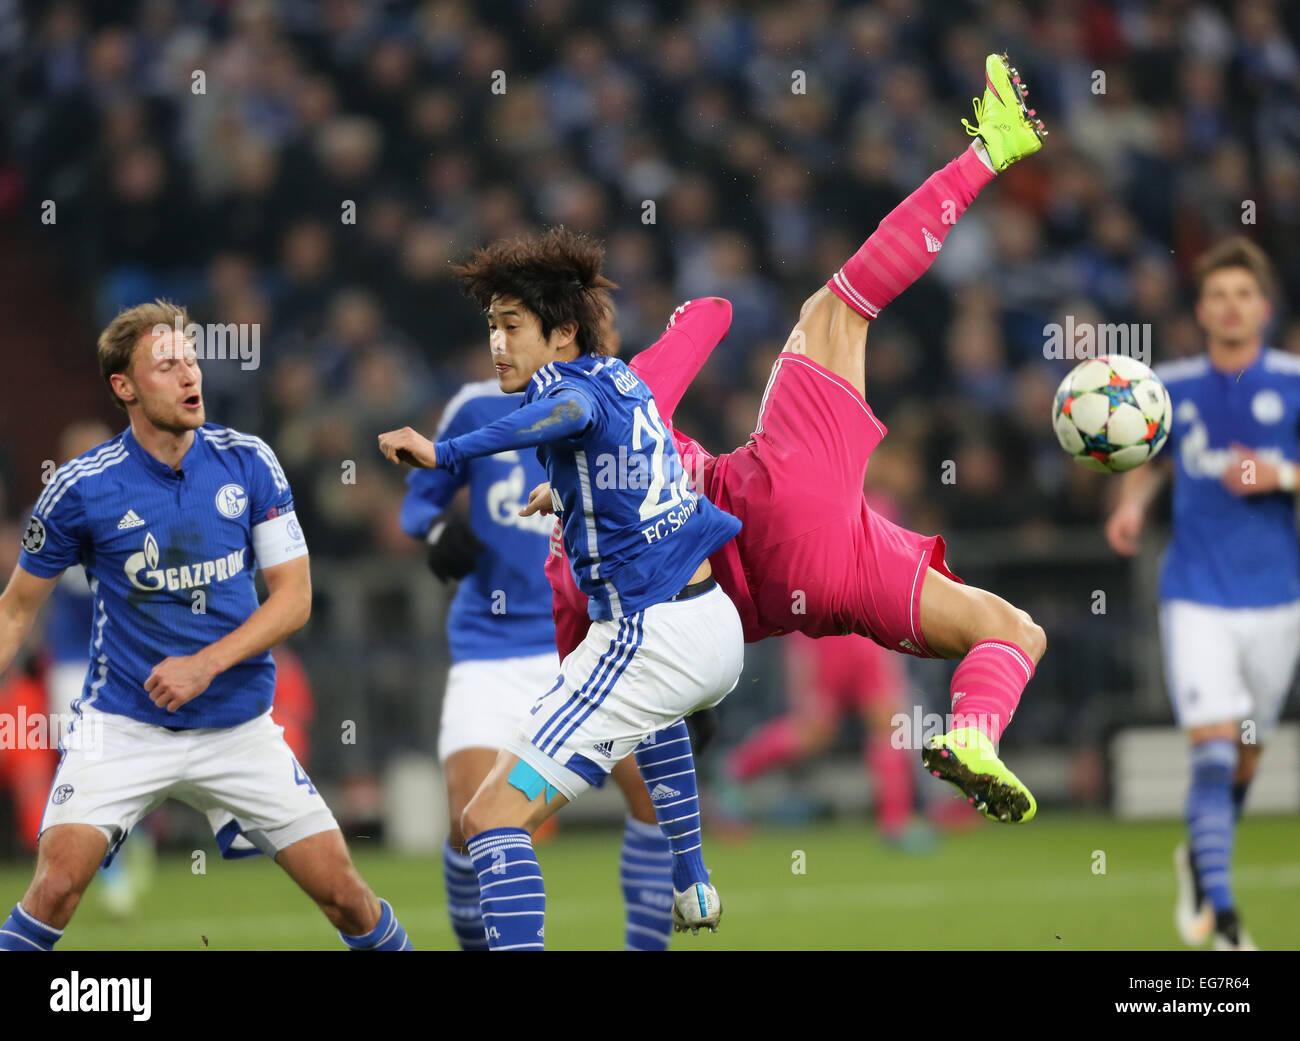 Schalke 04 реал мадрид